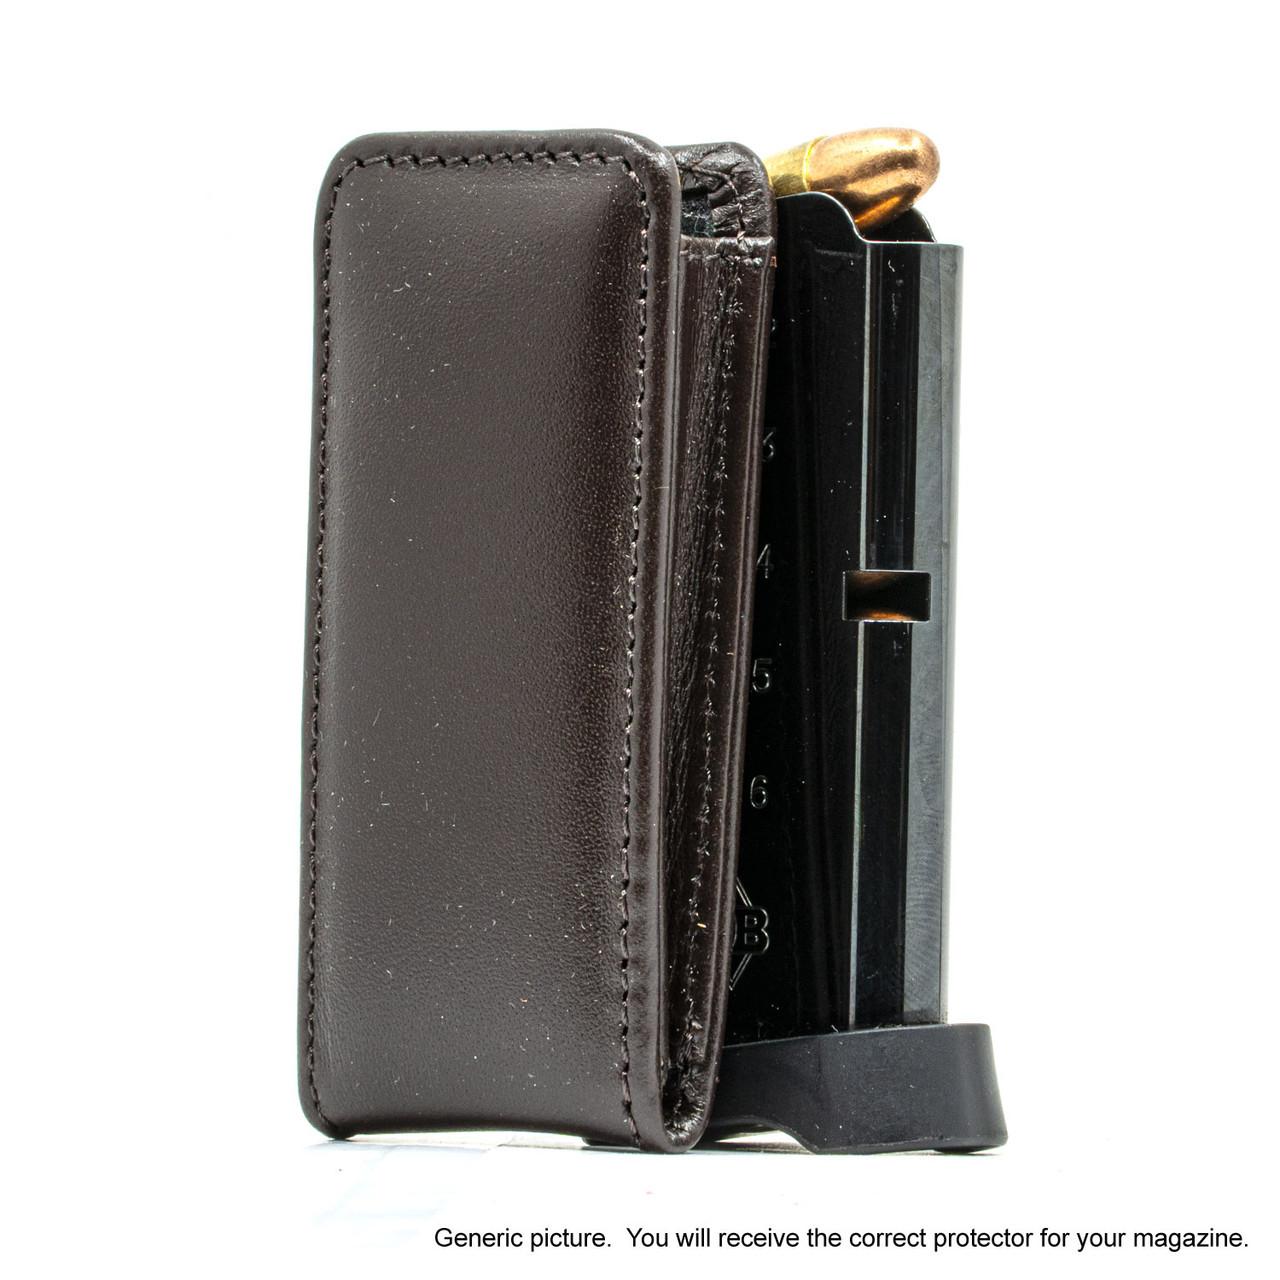 Taurus 740 Brown Leather Magazine Pocket Protector